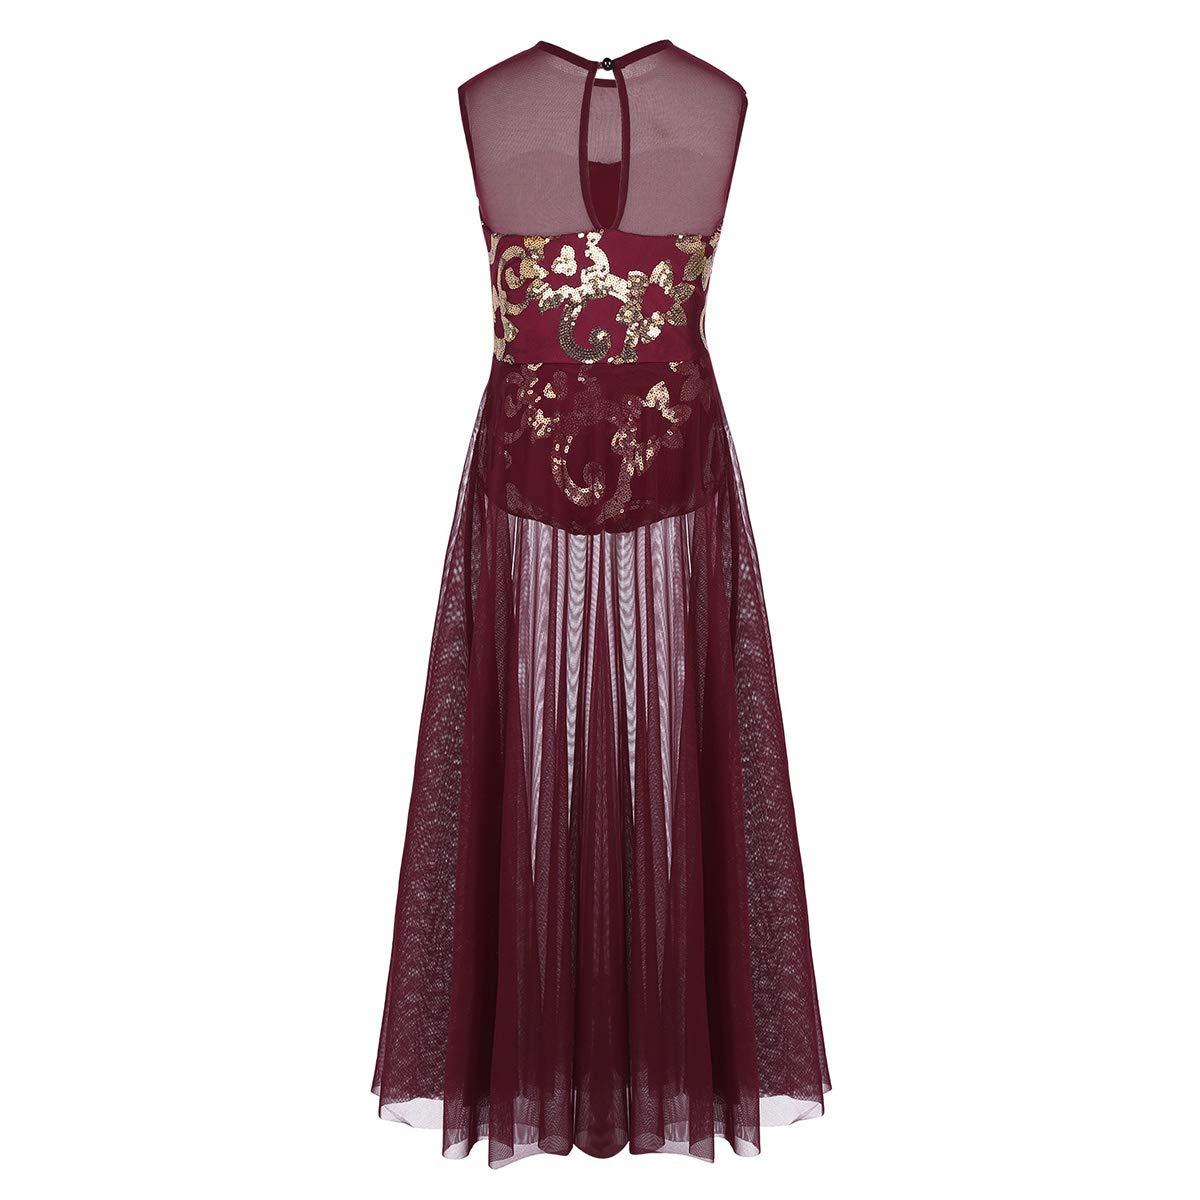 inhzoy Girls Sleeveless Floral Sequins Tank Leotard Maxi Skirt for Celebration of Spirit Praise Dance